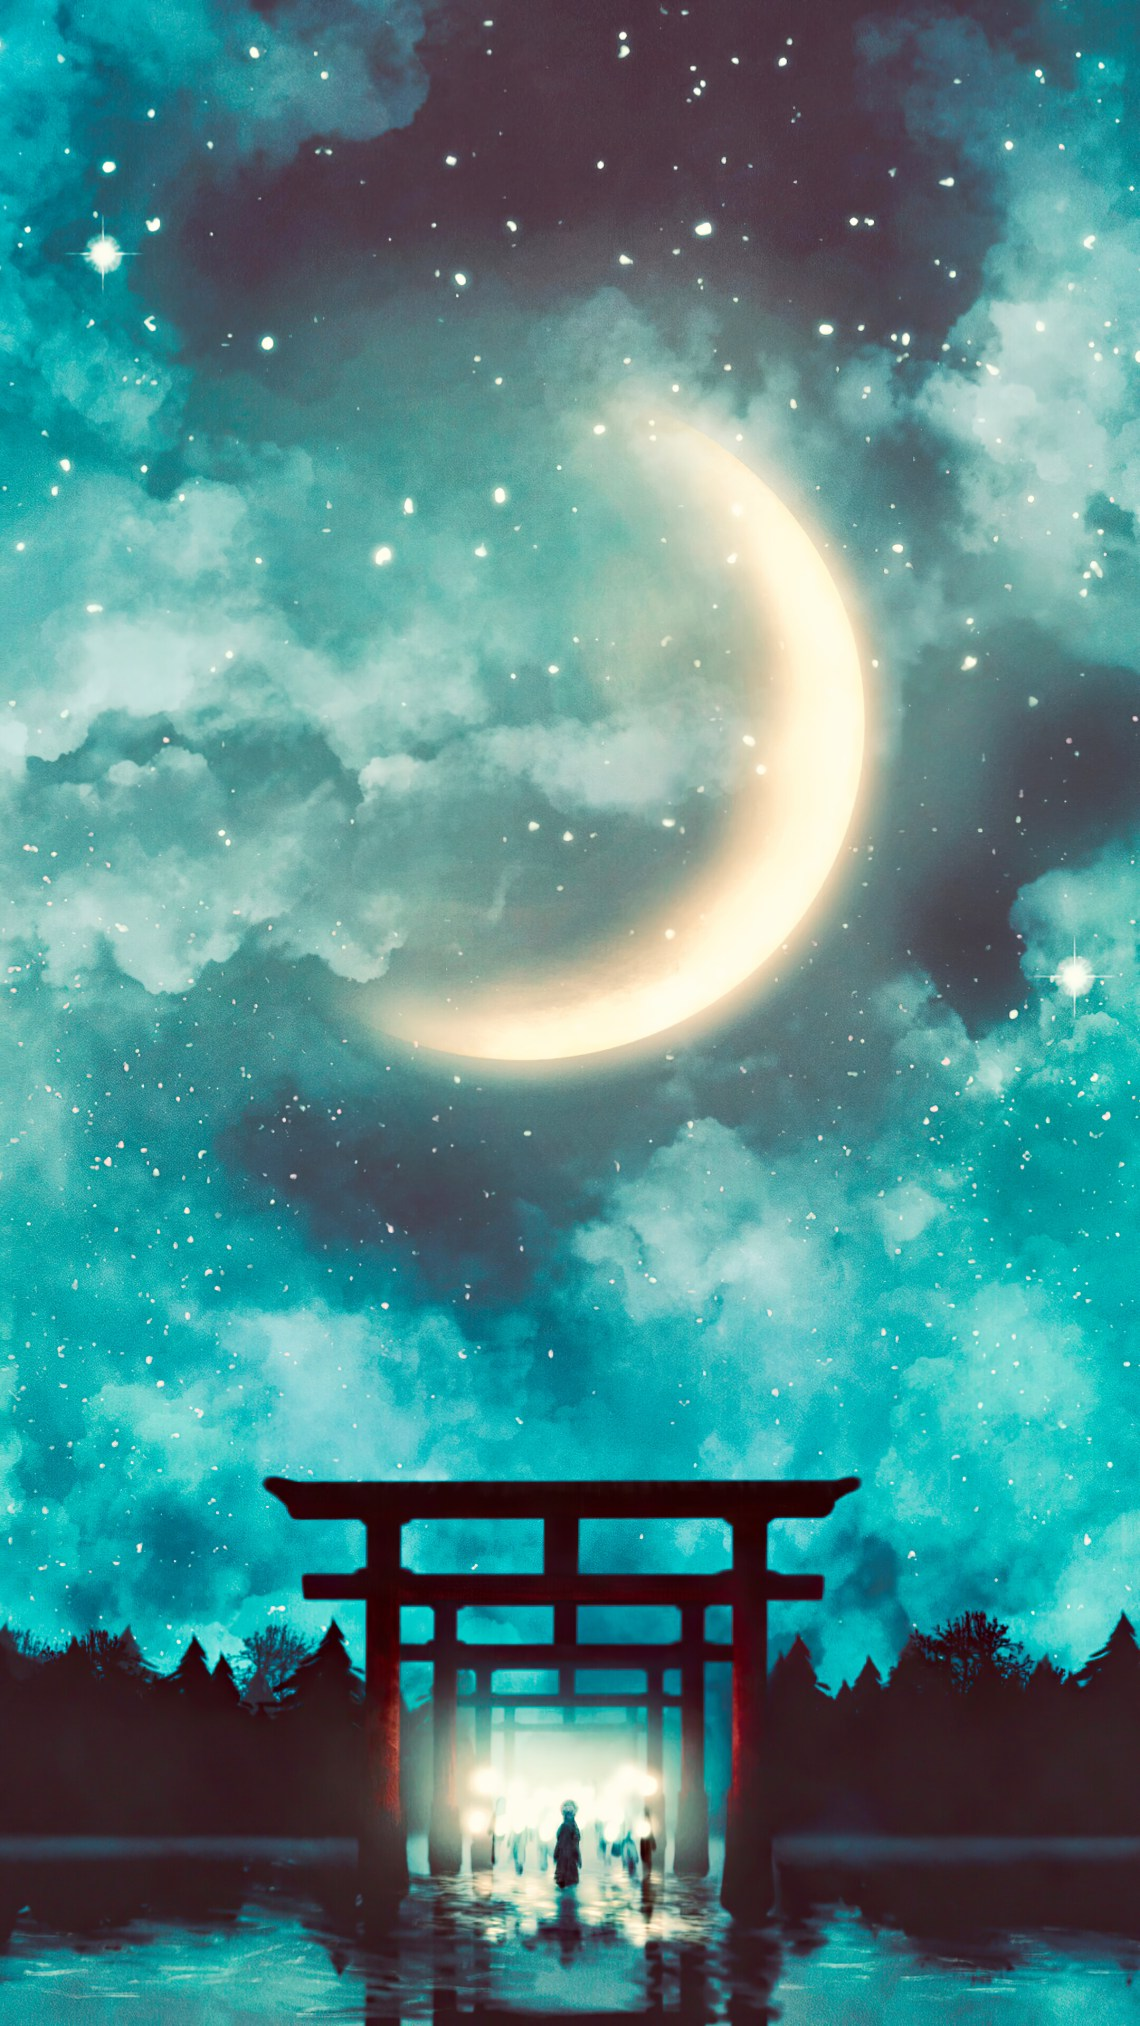 Shrine Gate Night Sky Anime Scenery 4k Wallpaper 6 2588